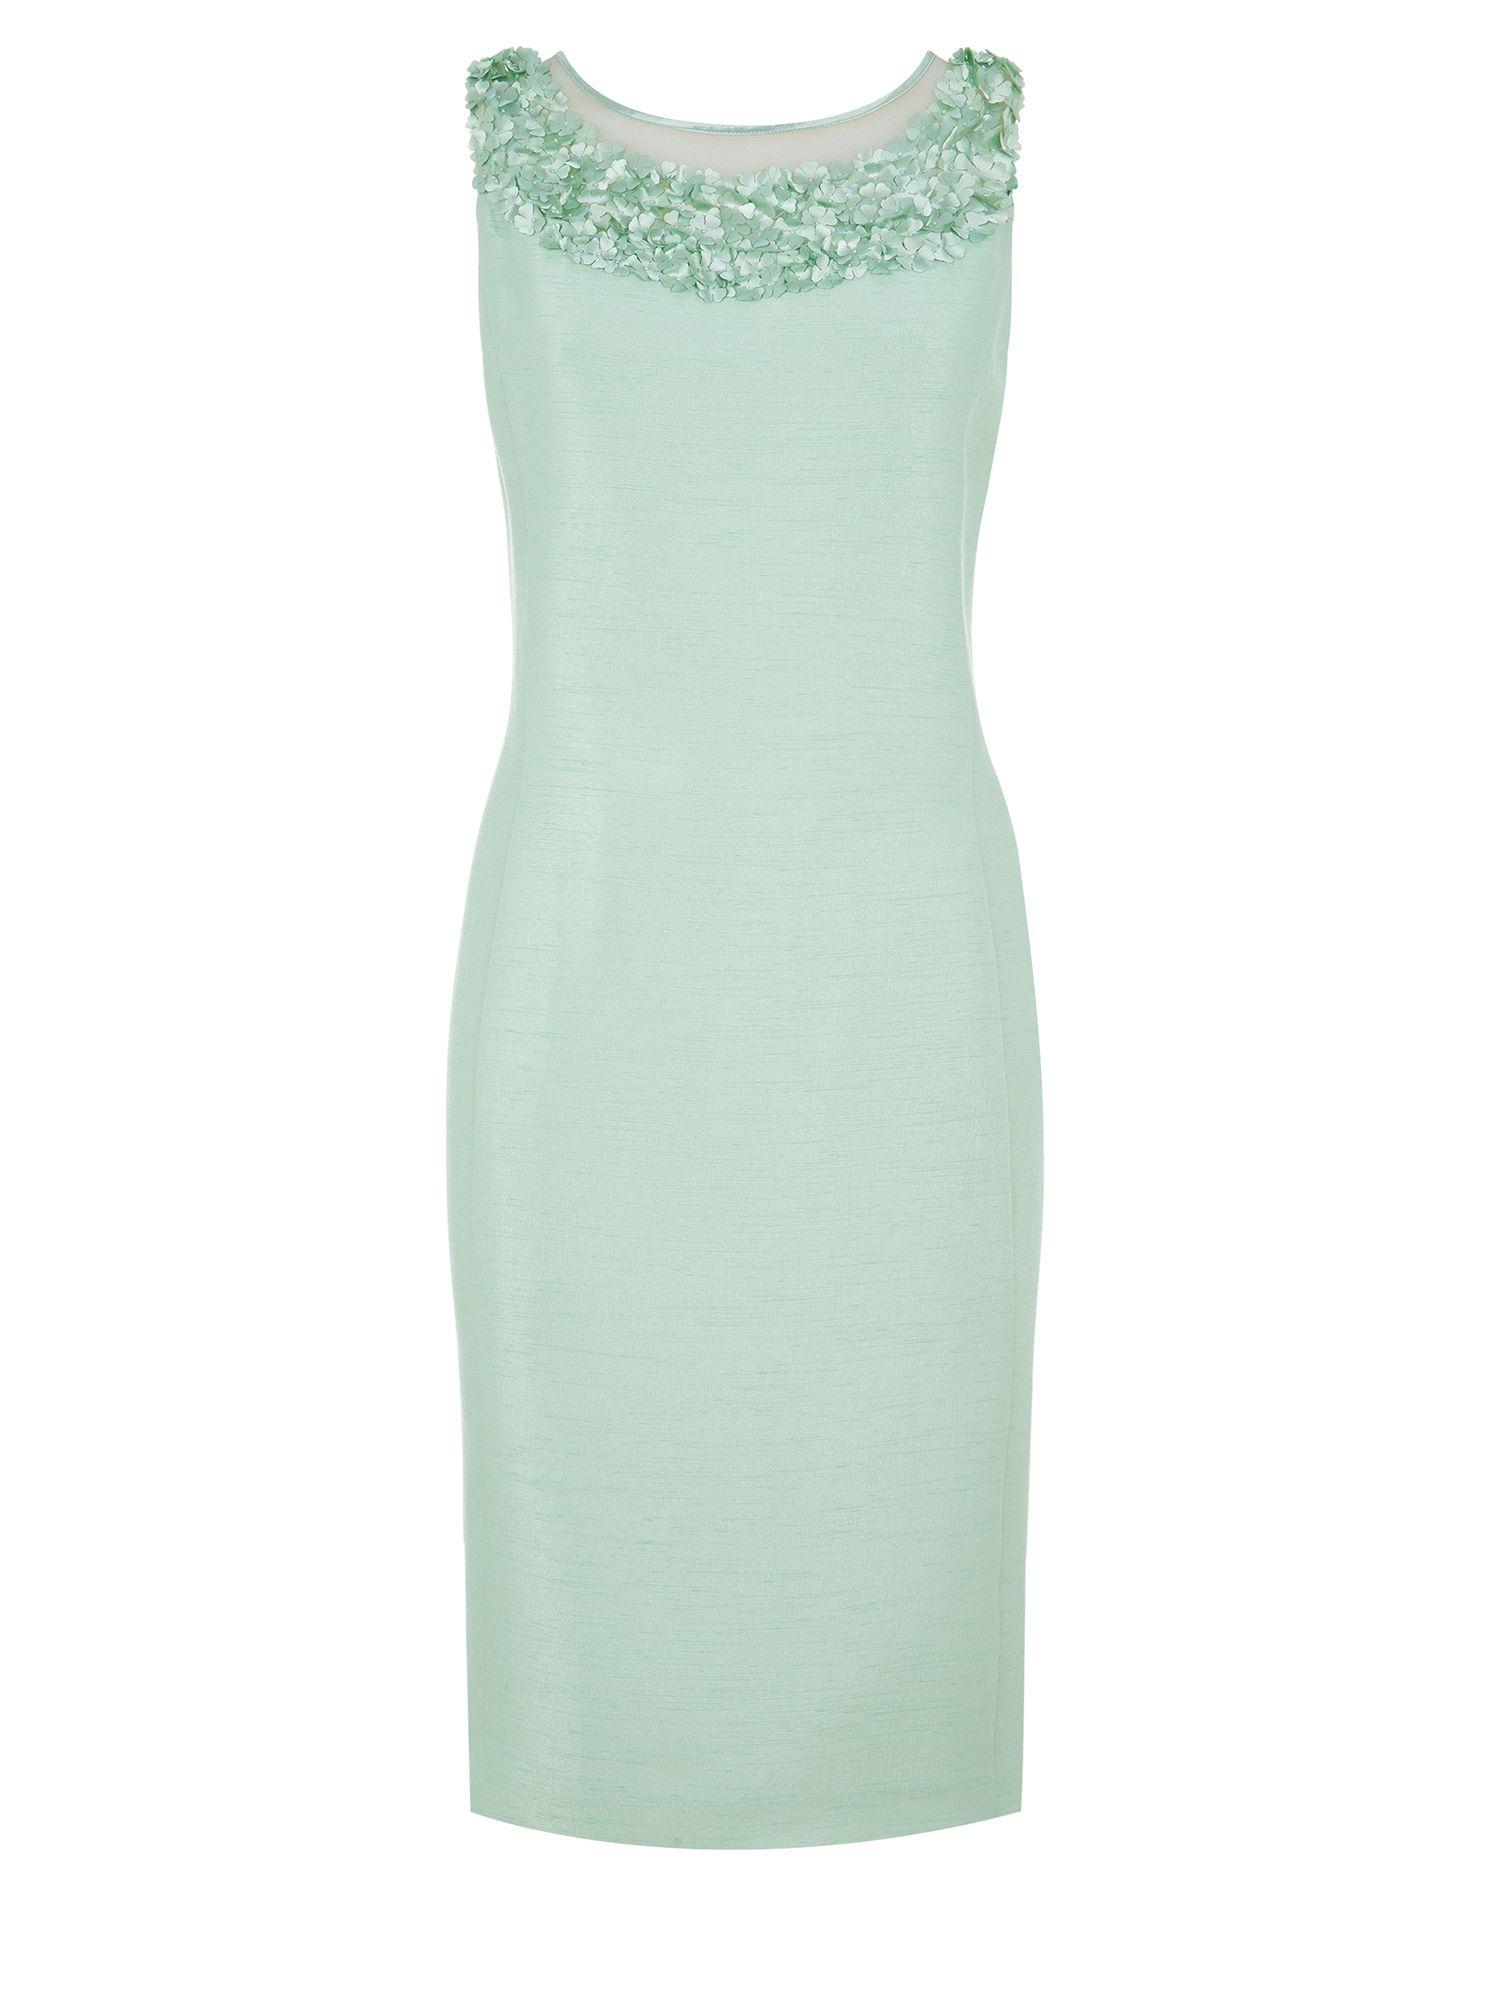 Lyst - Jacques Vert Flower Embellished Shift Dress in Green